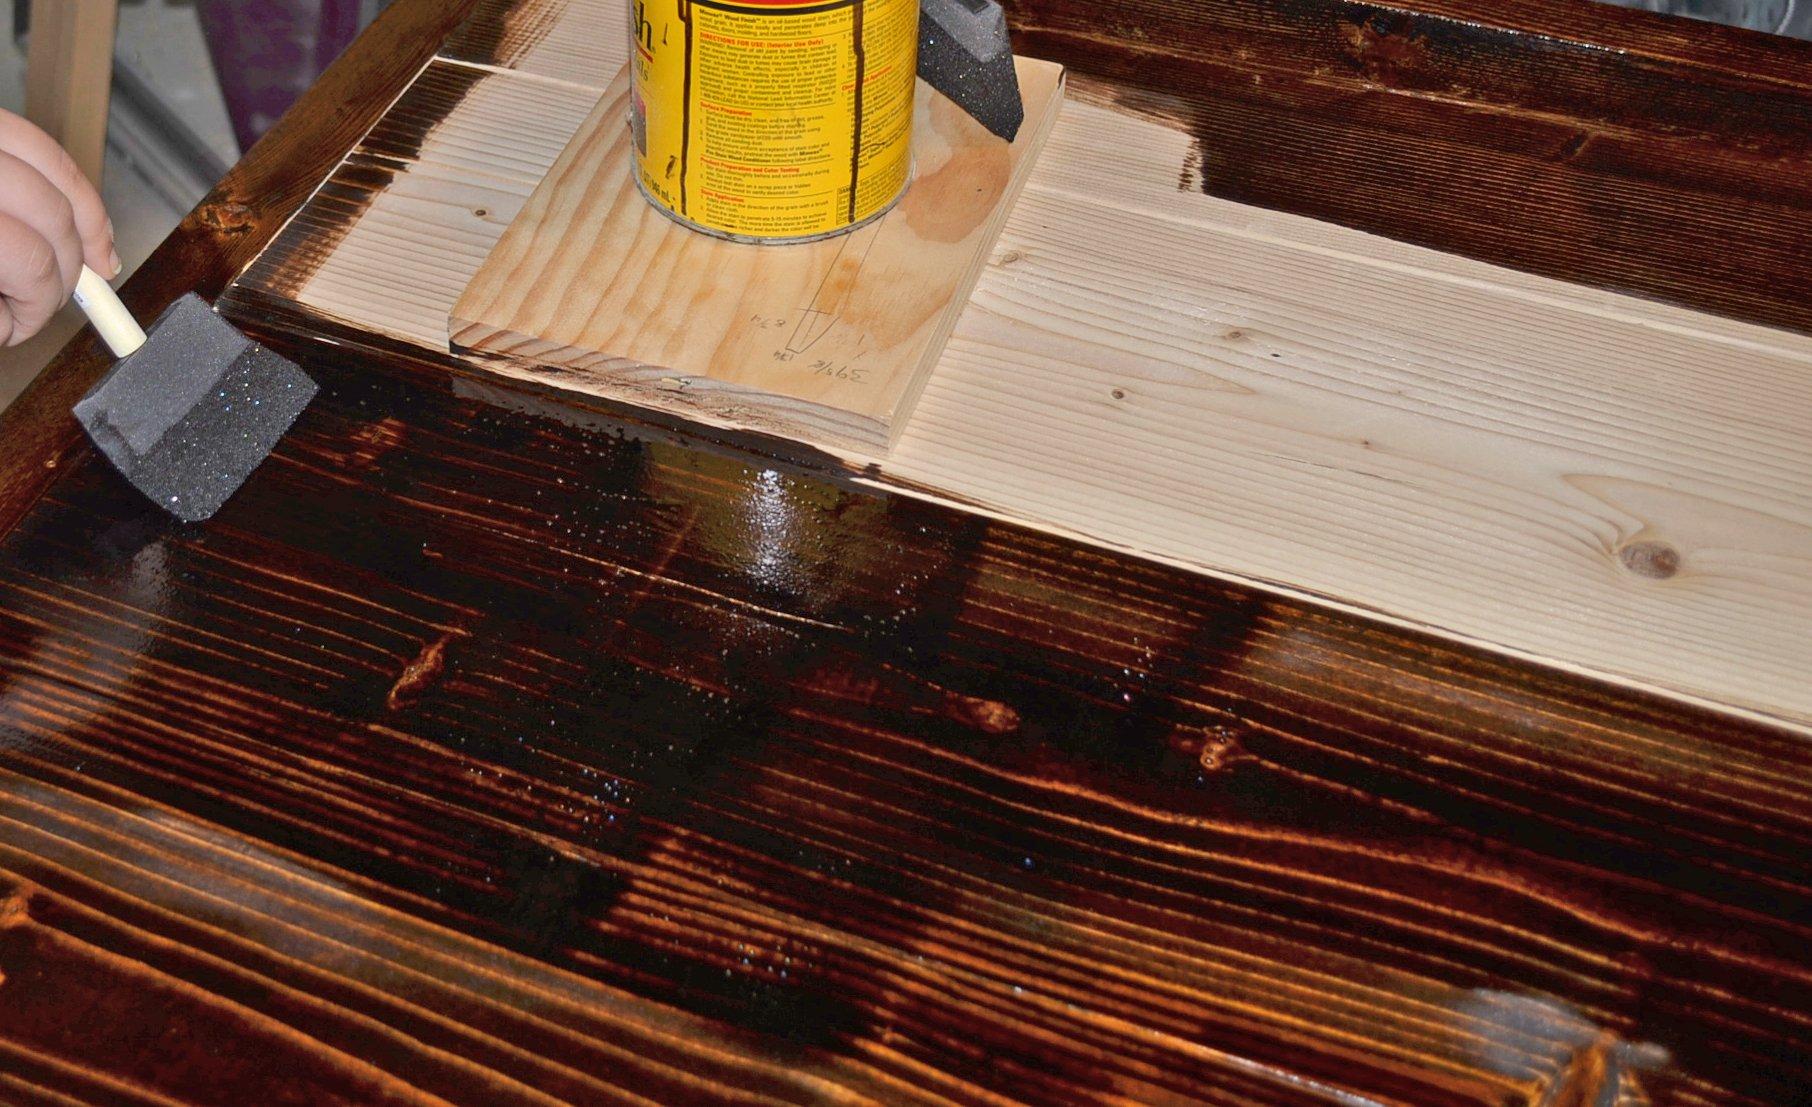 DIY Simple Wood Slab Coffee Table Remodelaholic Bloglovin - Build a simple coffee table